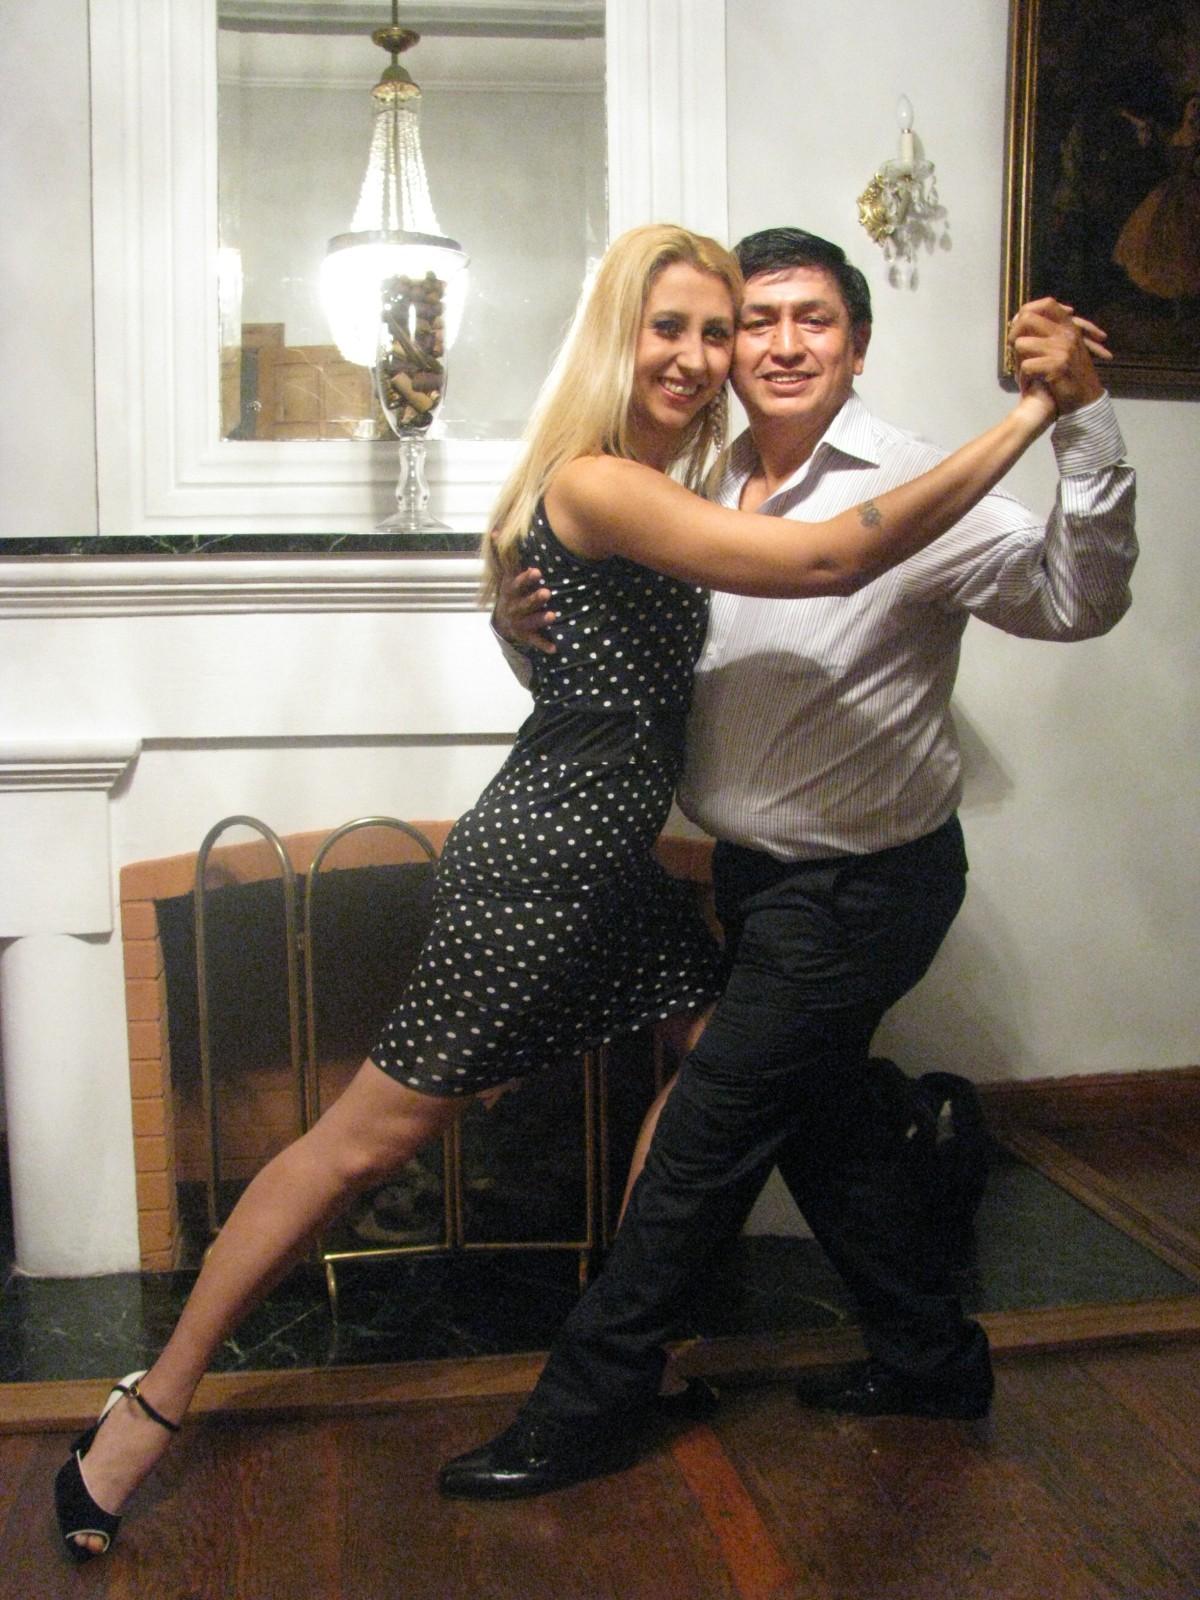 Gardenia-rolando-ci-tango-2013.jpg